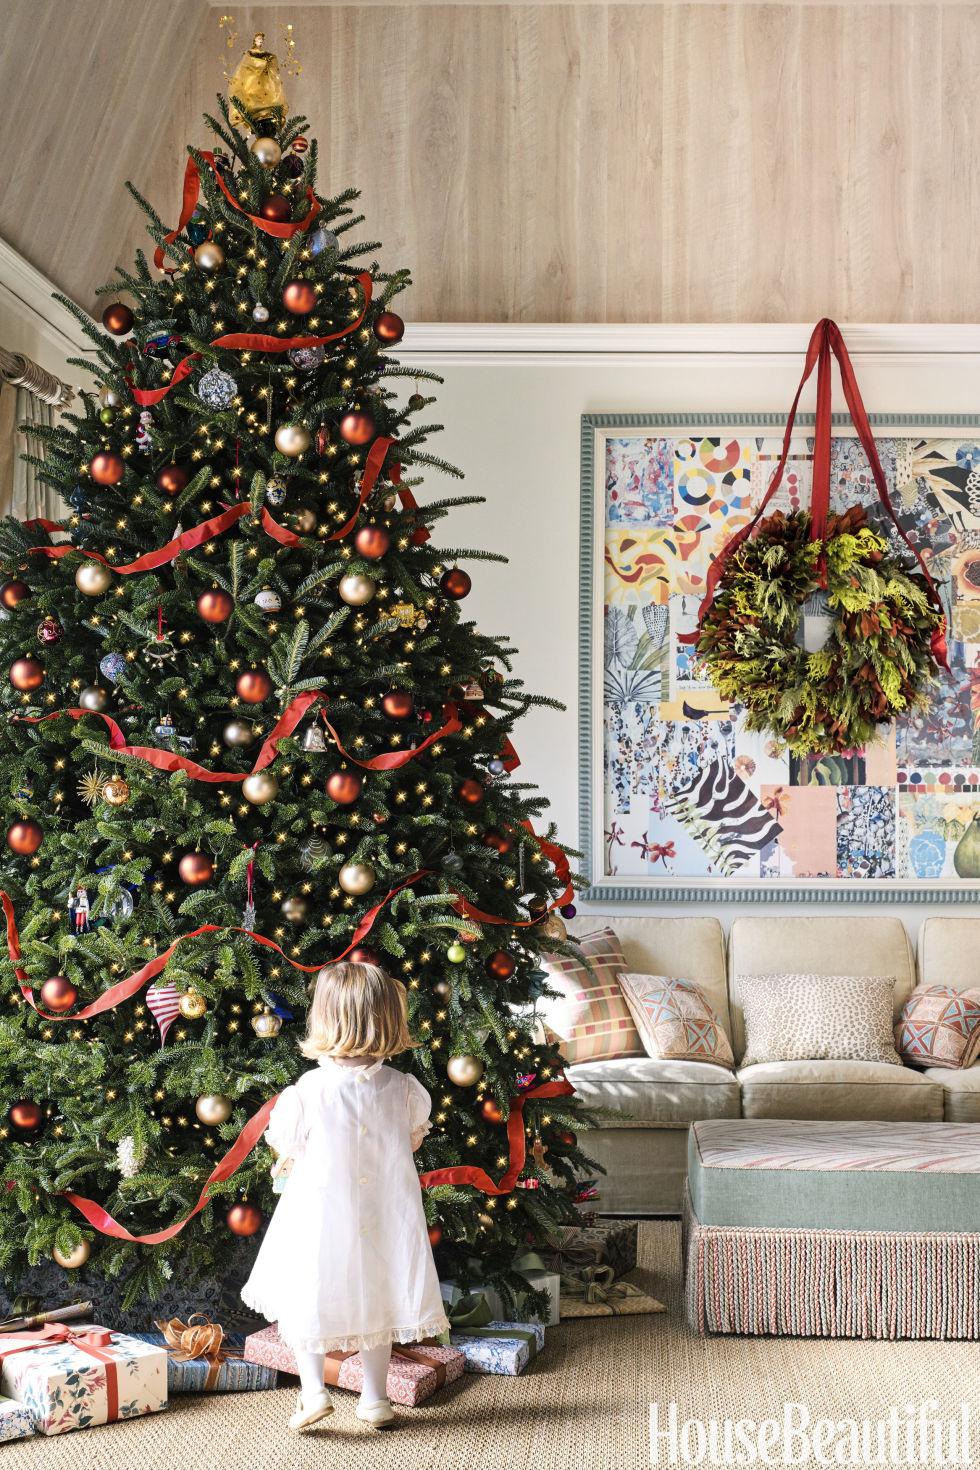 House Beautiful Decorating catherine olasky decorates texas home for christmas - holiday